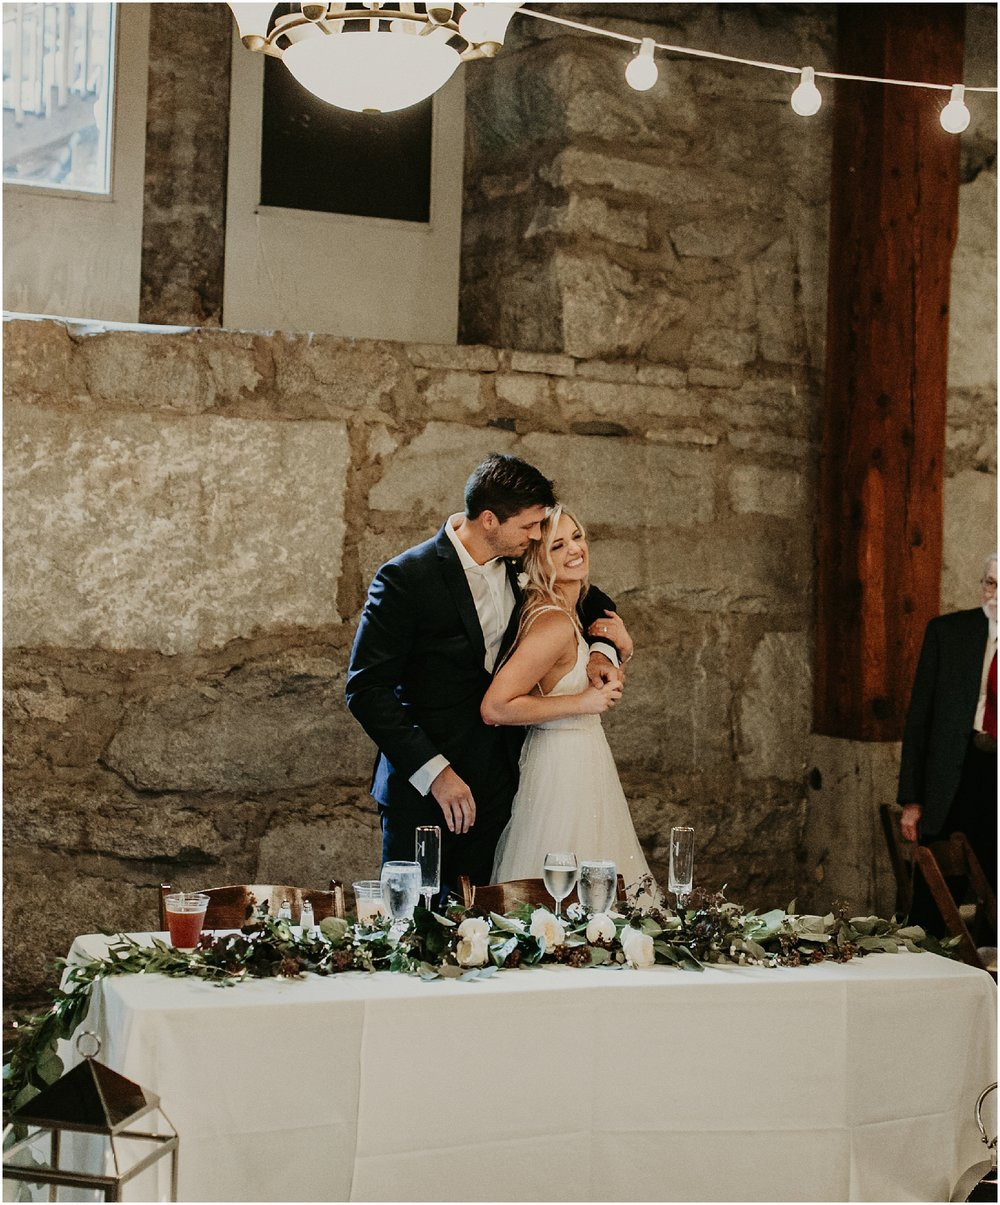 Chateau Rive Spokane Wedding Cassie Trottier Photography1133.jpg